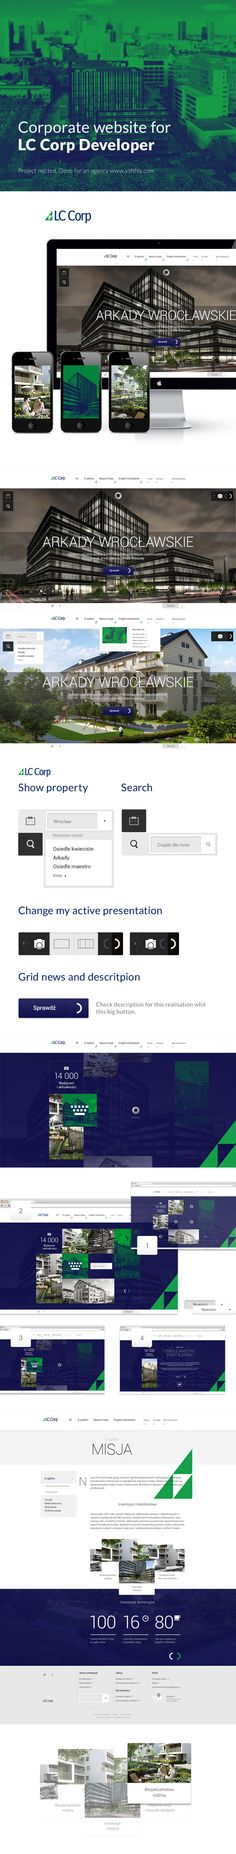 Developer, corporate website by Piotr Kazmierczak, via Behance